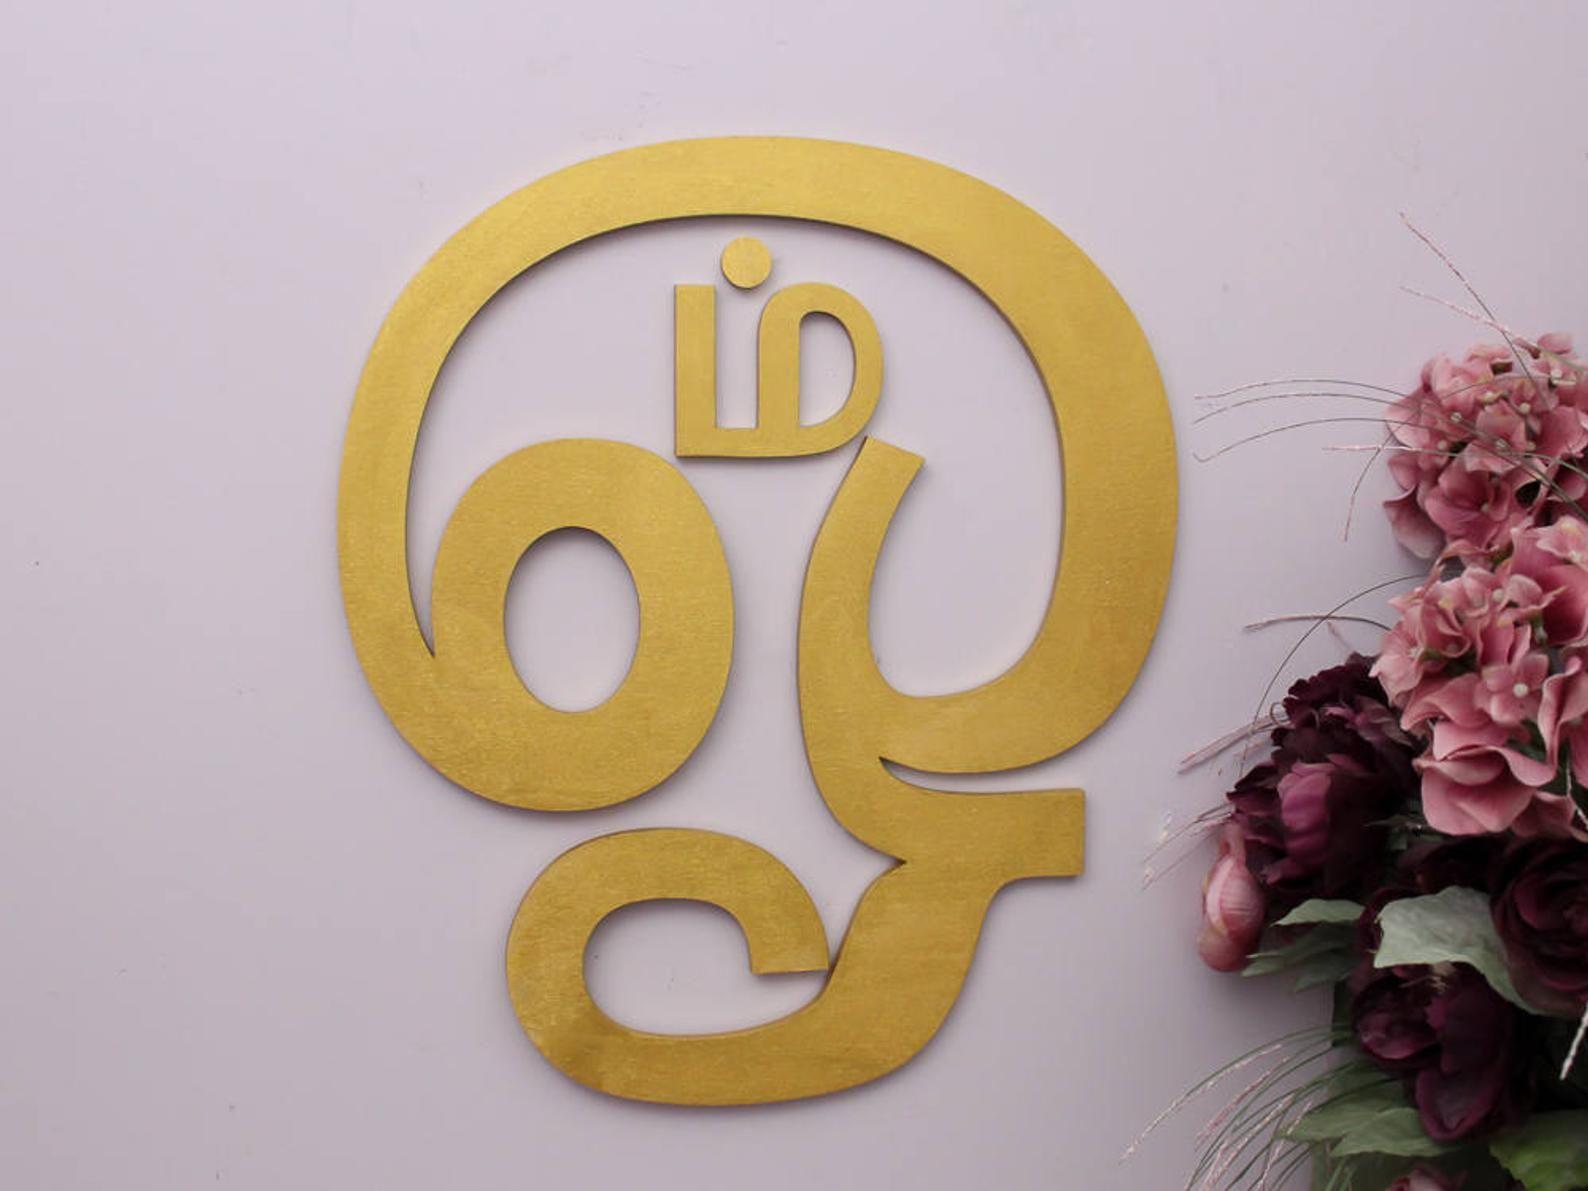 Tamil OHM Symbol, Aum Sign, Diwali Decorations, Diwali Decor, Indian Living Room Decor, Indian Home Decoration, New Home Housewarming Gift